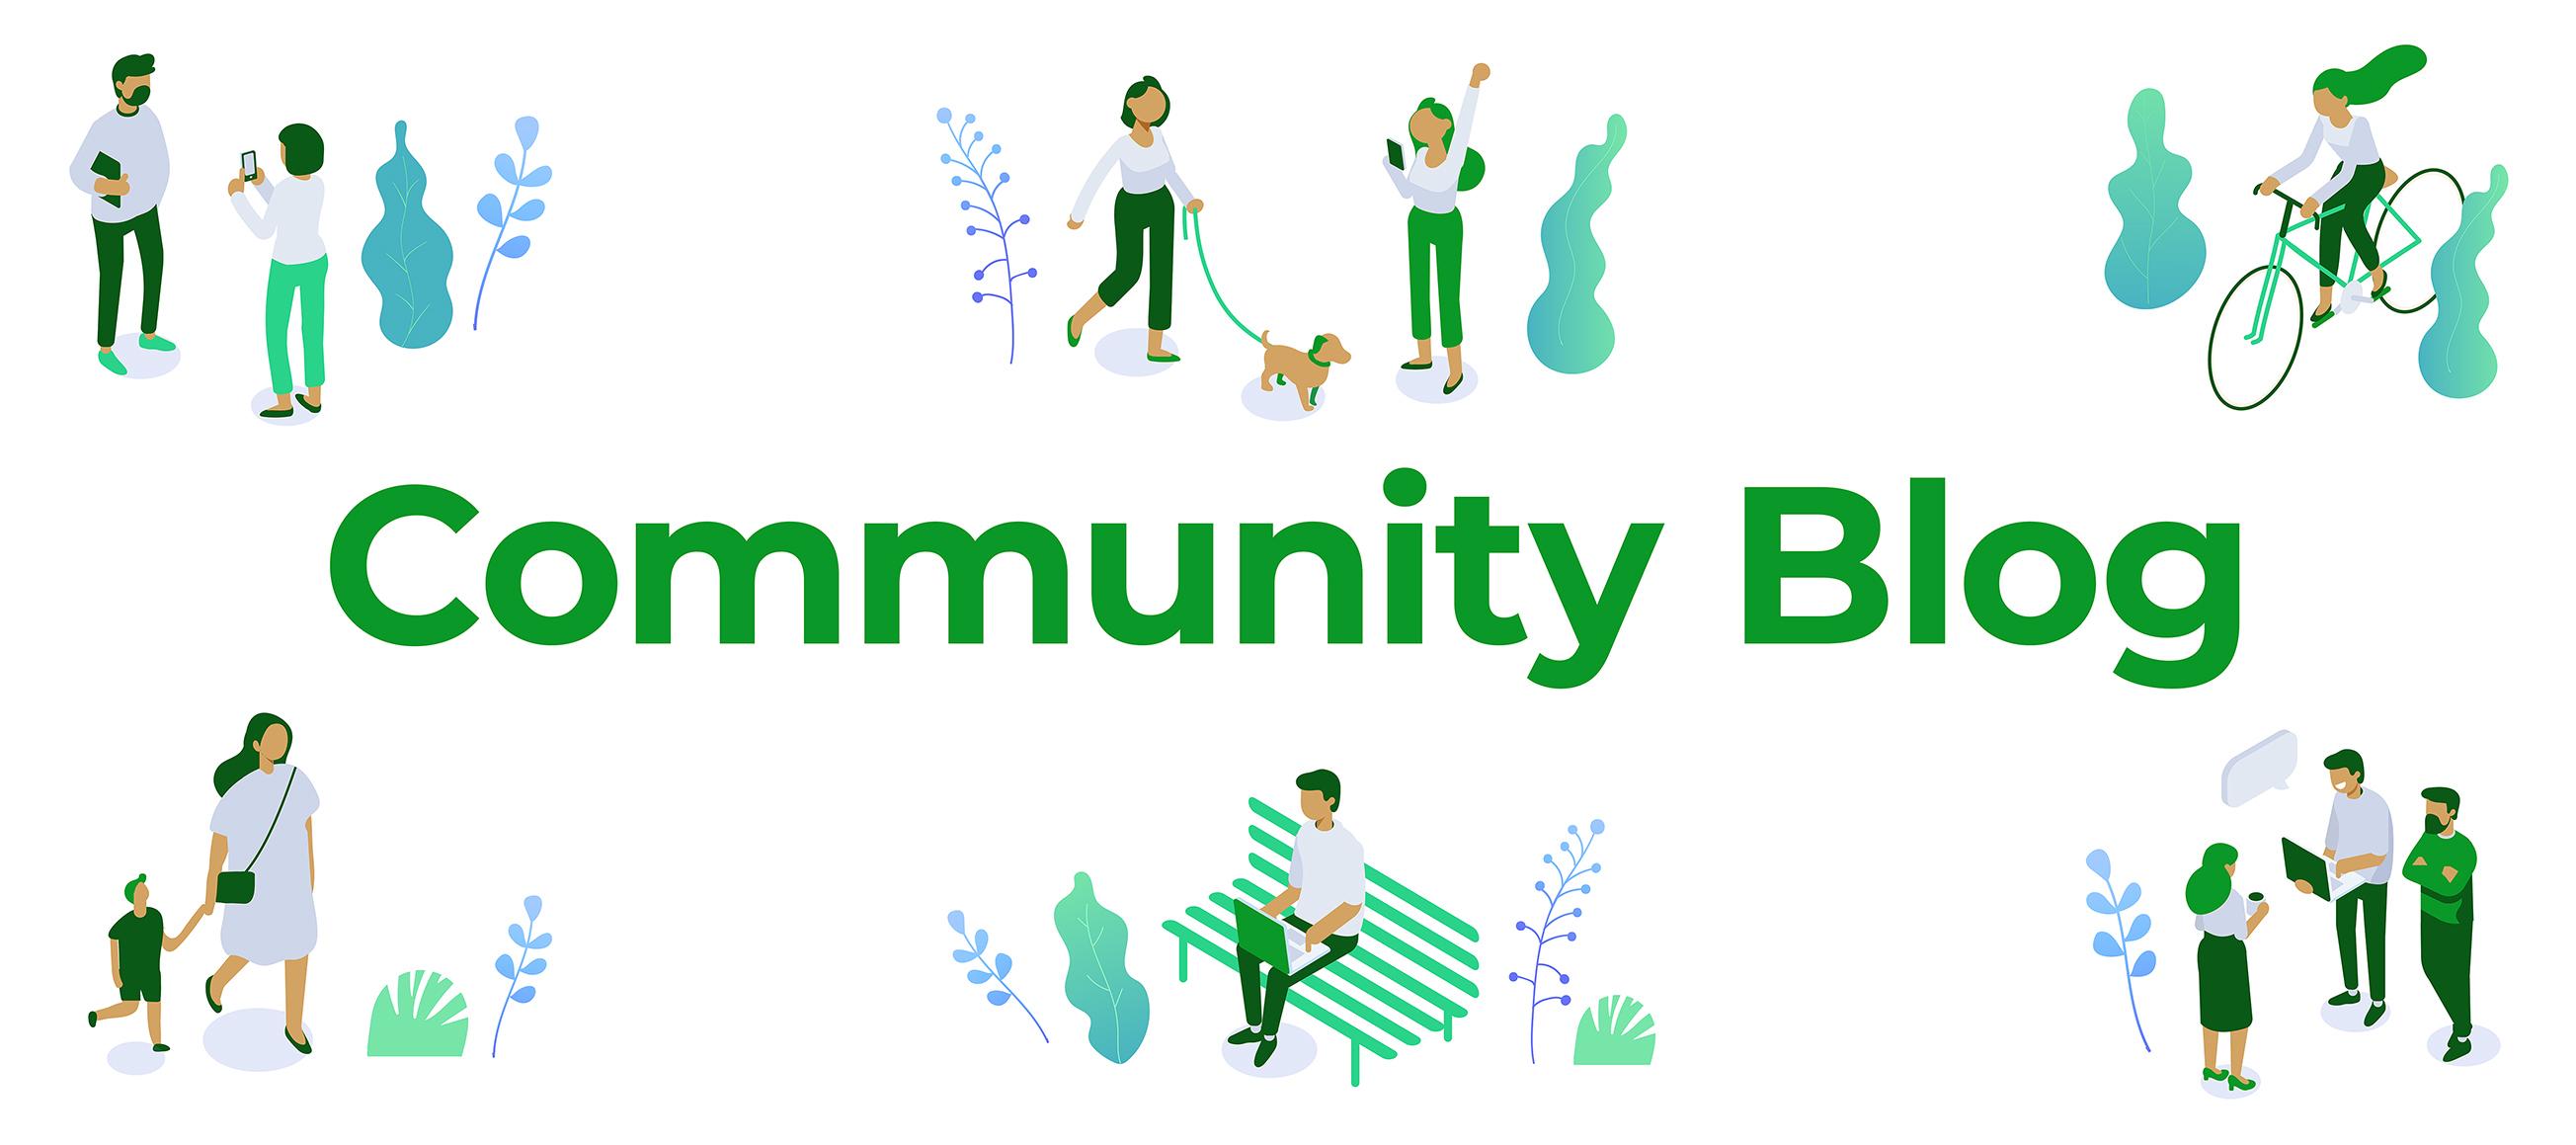 OVO Community Blog - Issue 14